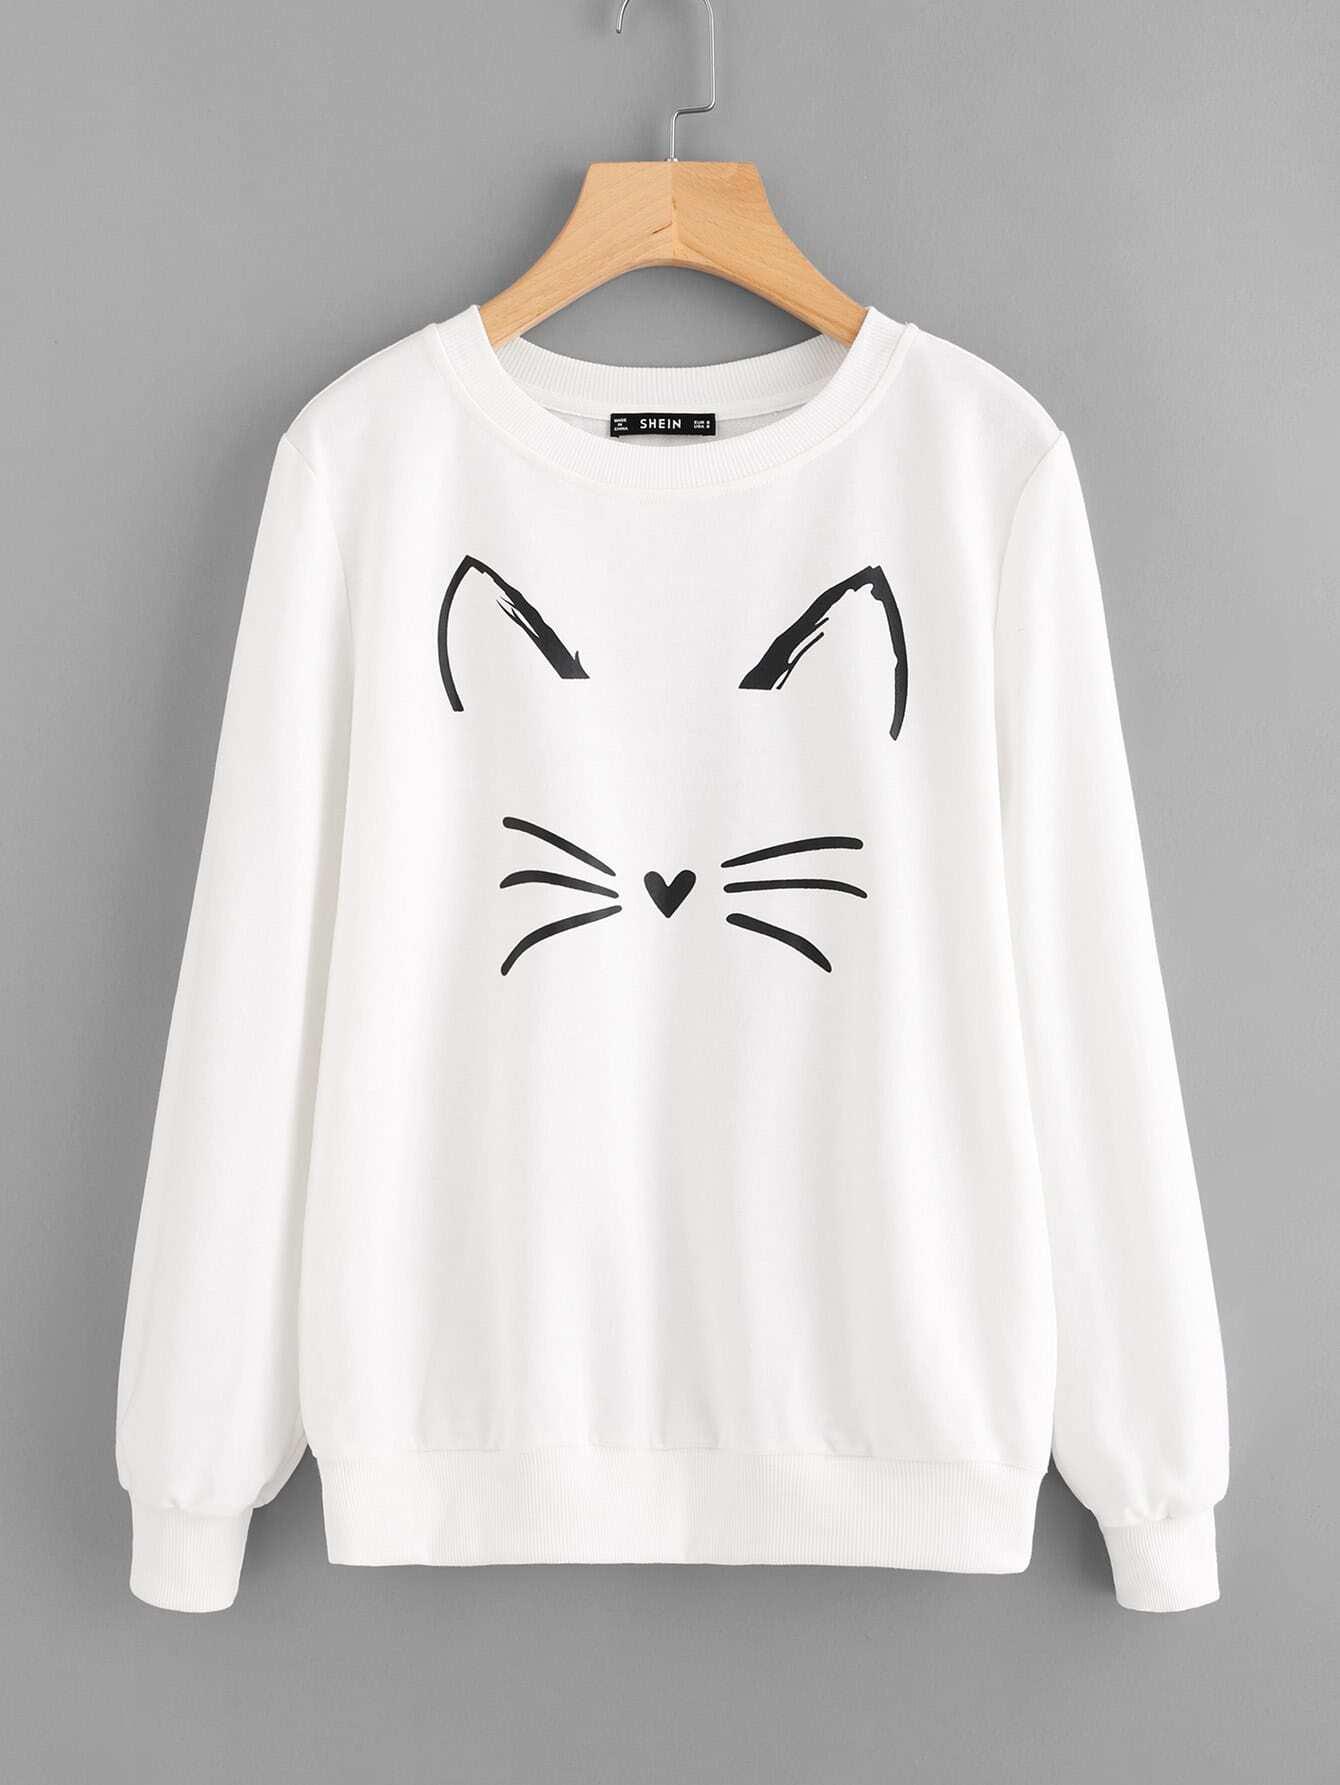 Cool Cat Clothing Uk